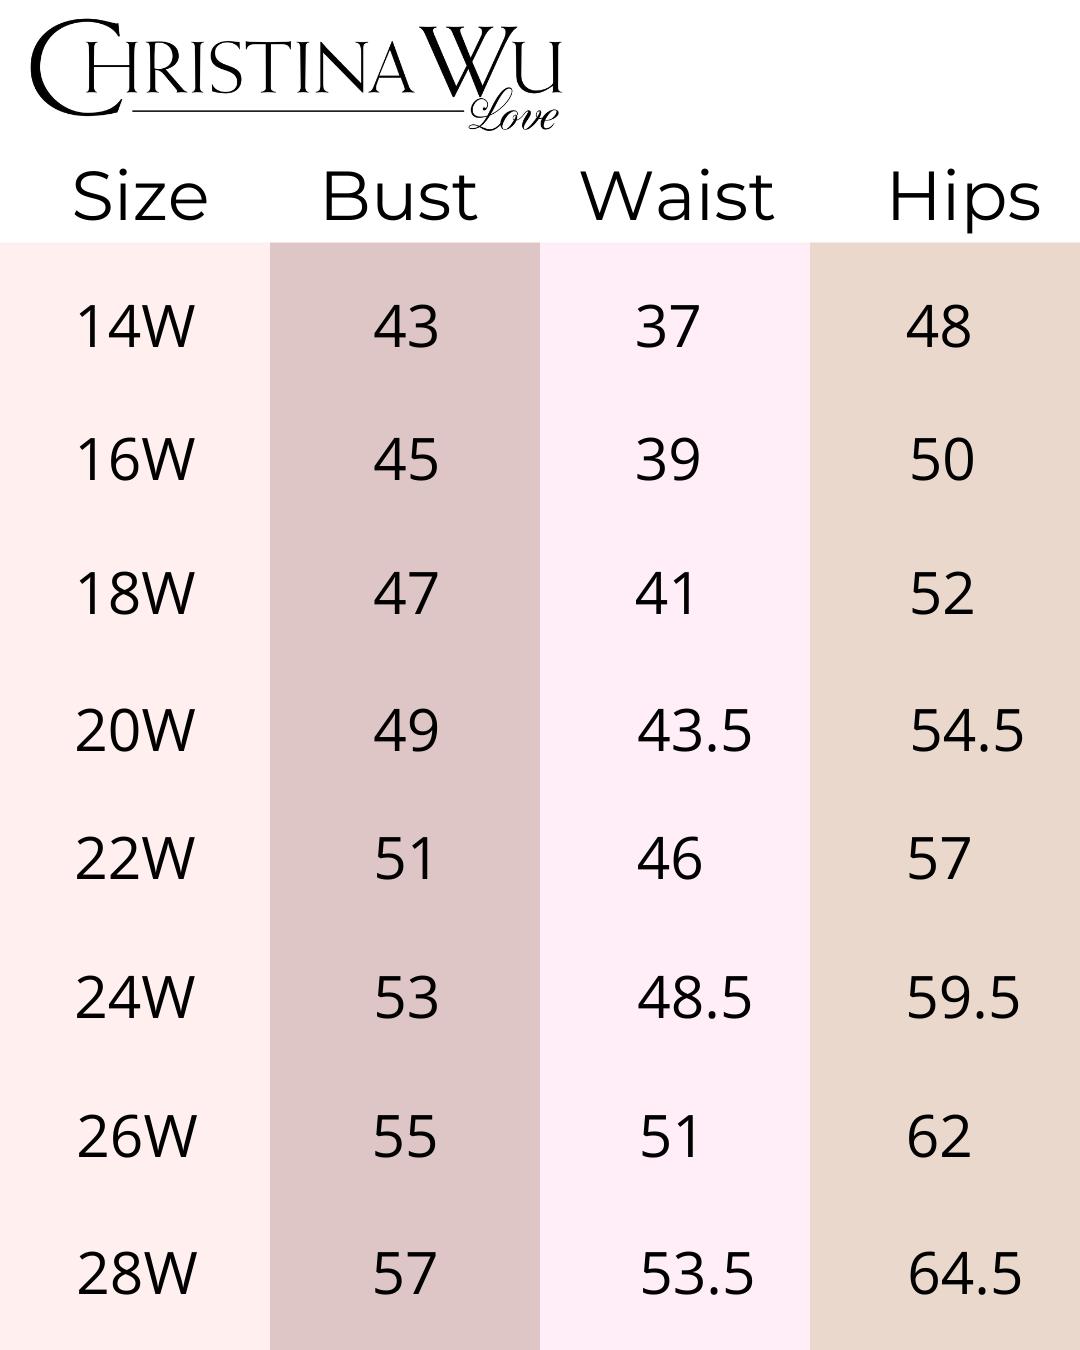 Christina Wu Love size chart